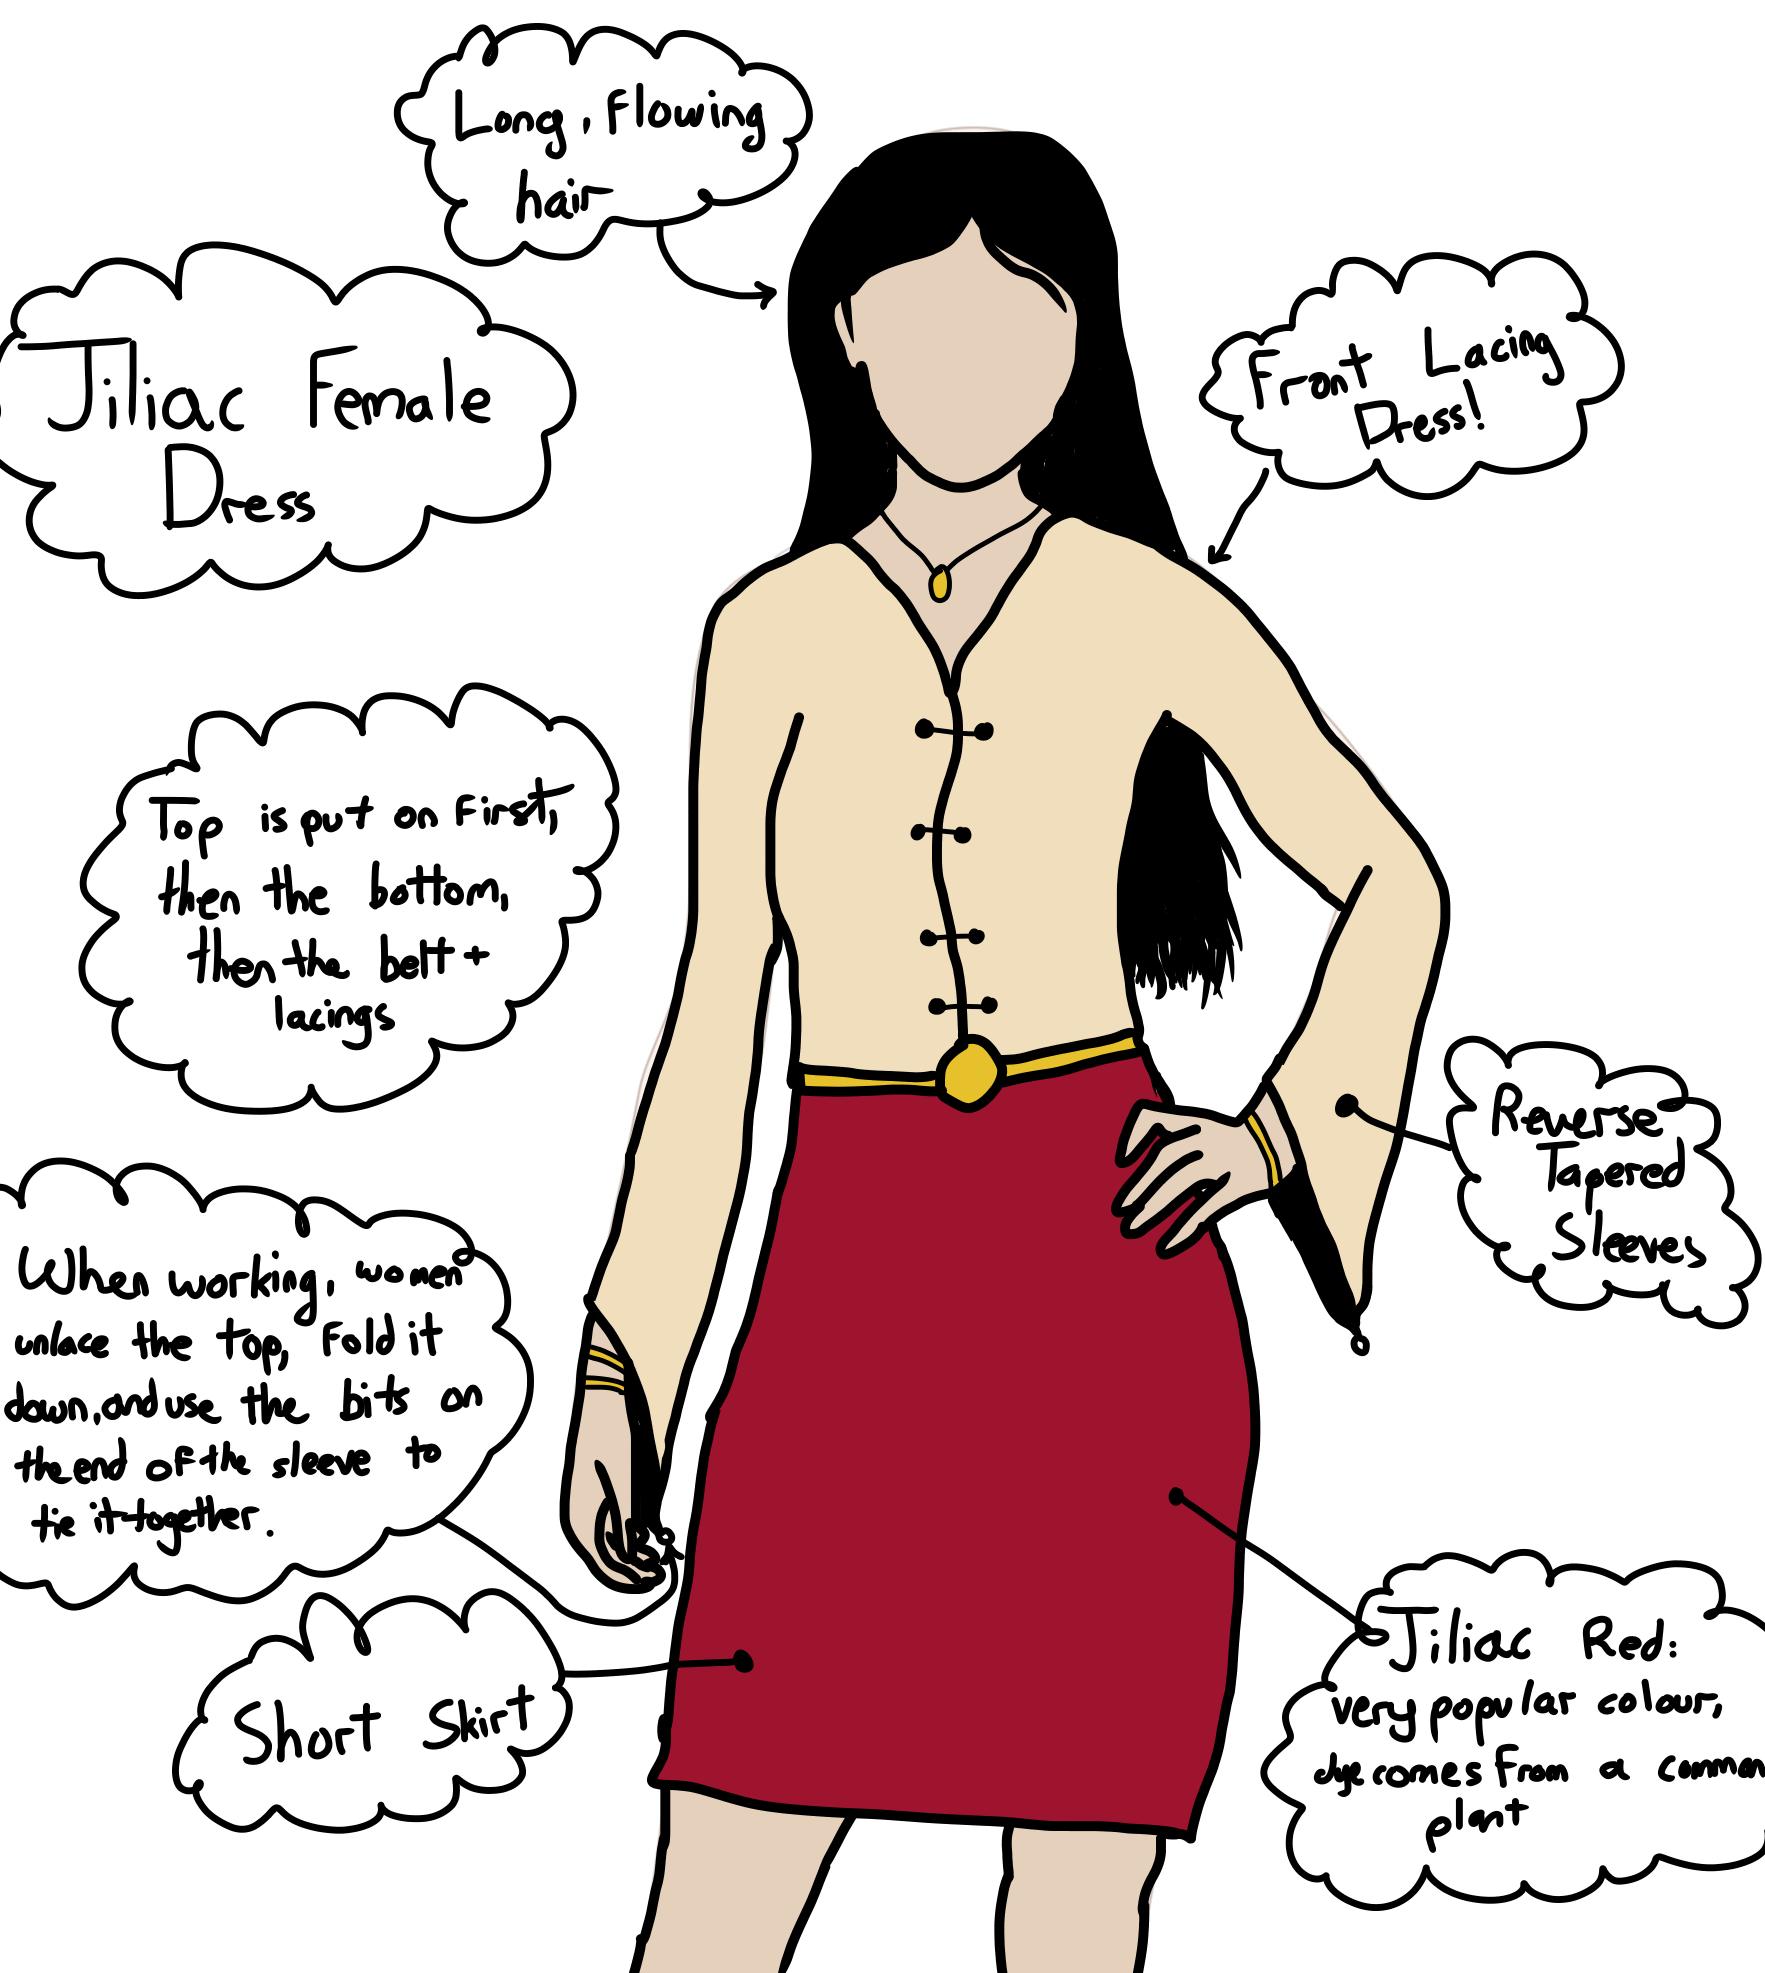 jiliac_dress.png